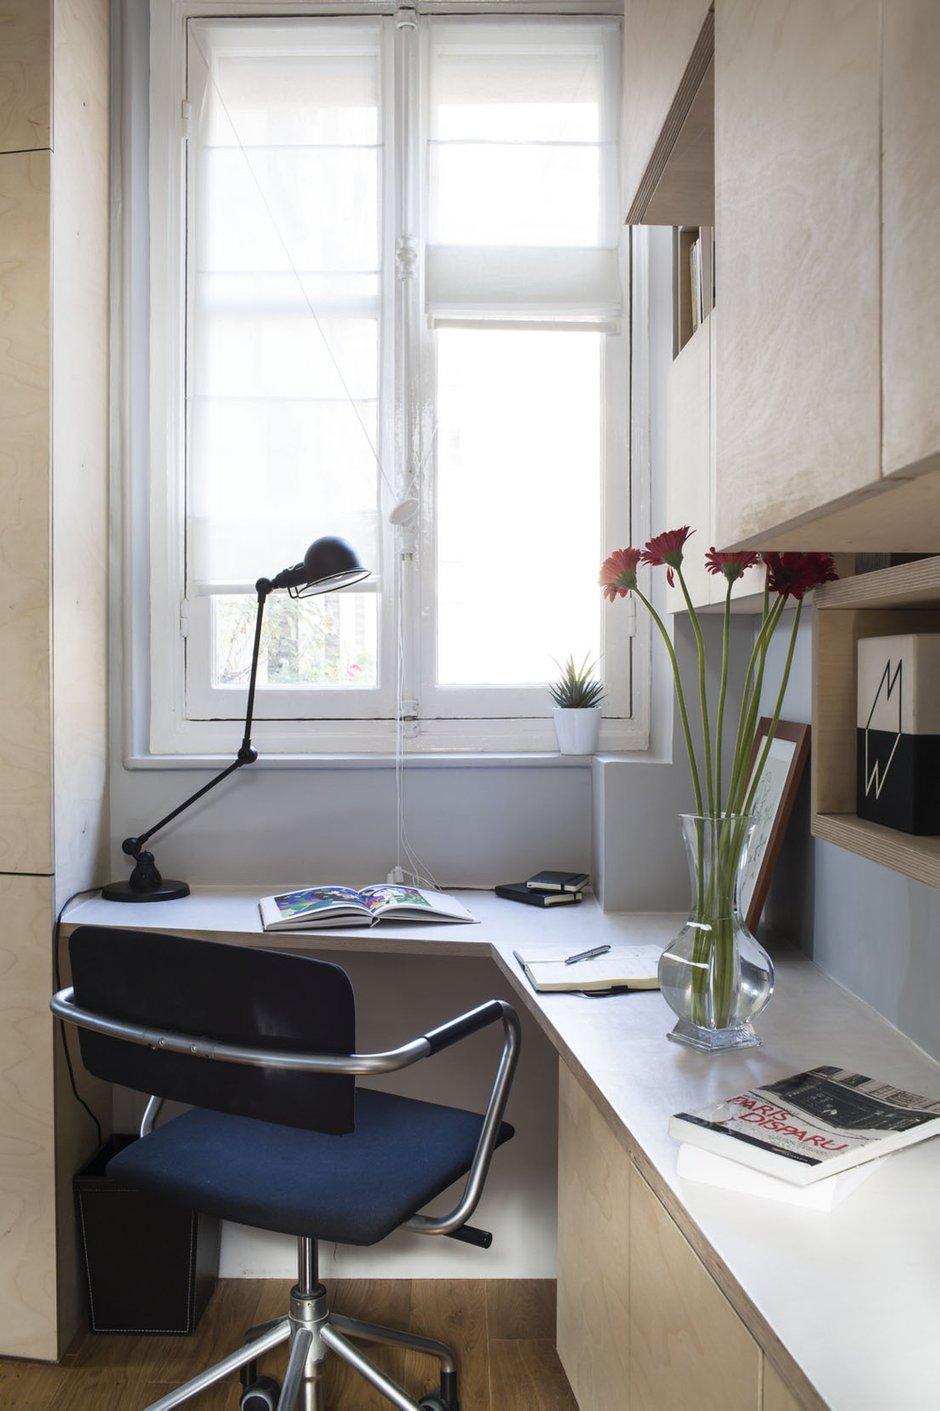 Фотография: Офис в стиле Современный, Лофт, Малогабаритная квартира, Квартира, Дома и квартиры – фото на INMYROOM